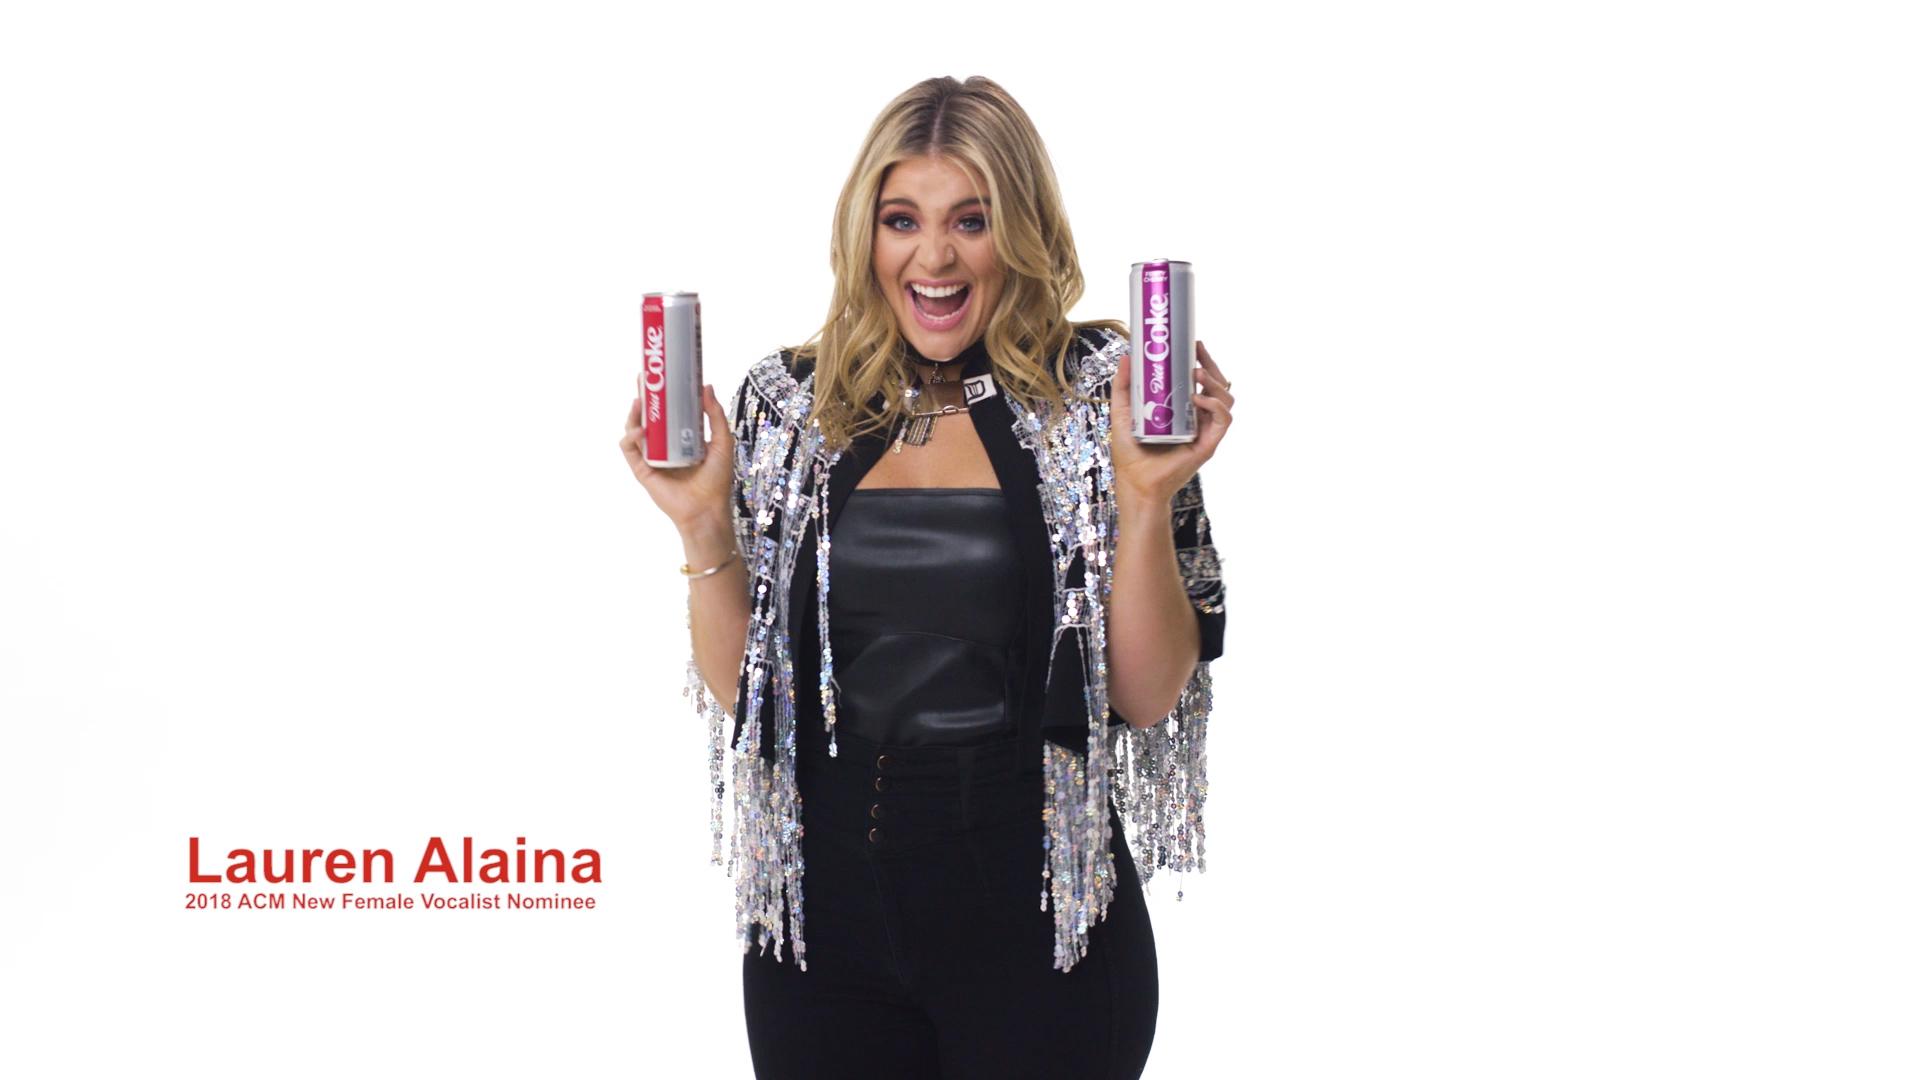 Lauren Alaina - Diet Coke